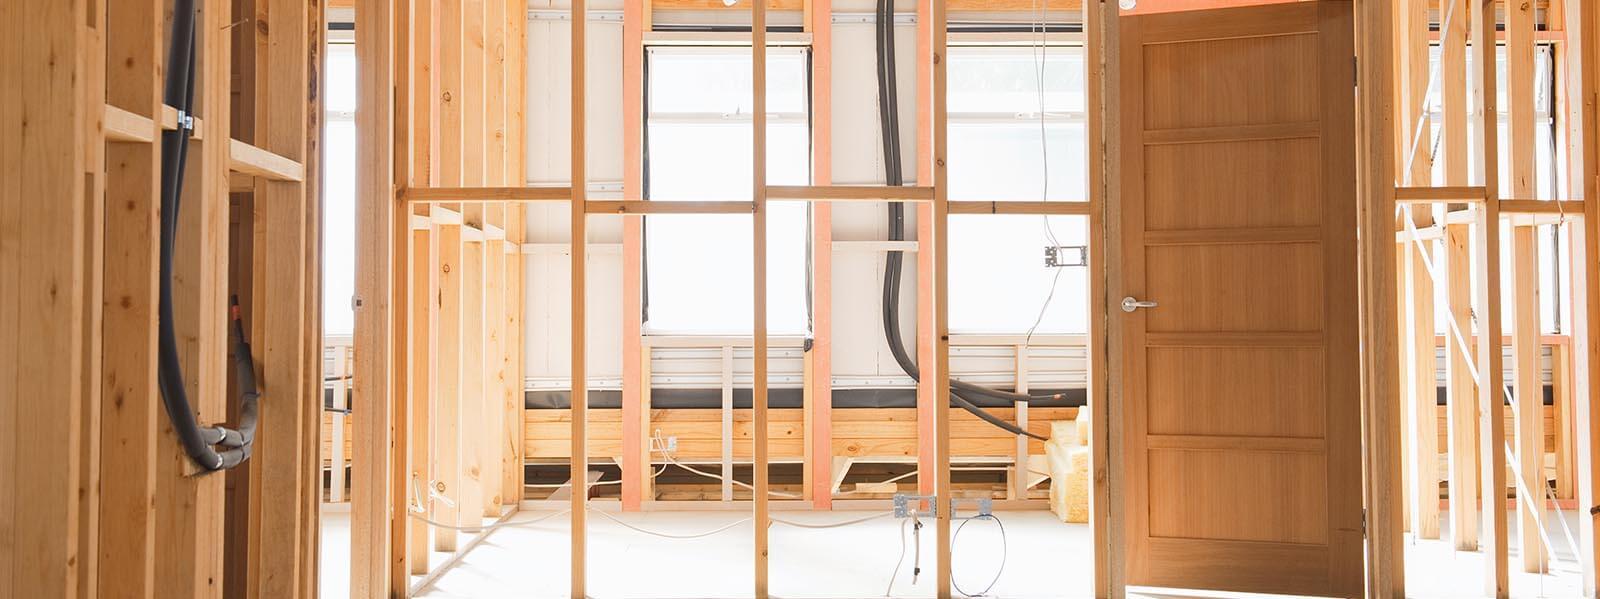 pre-wire your Home